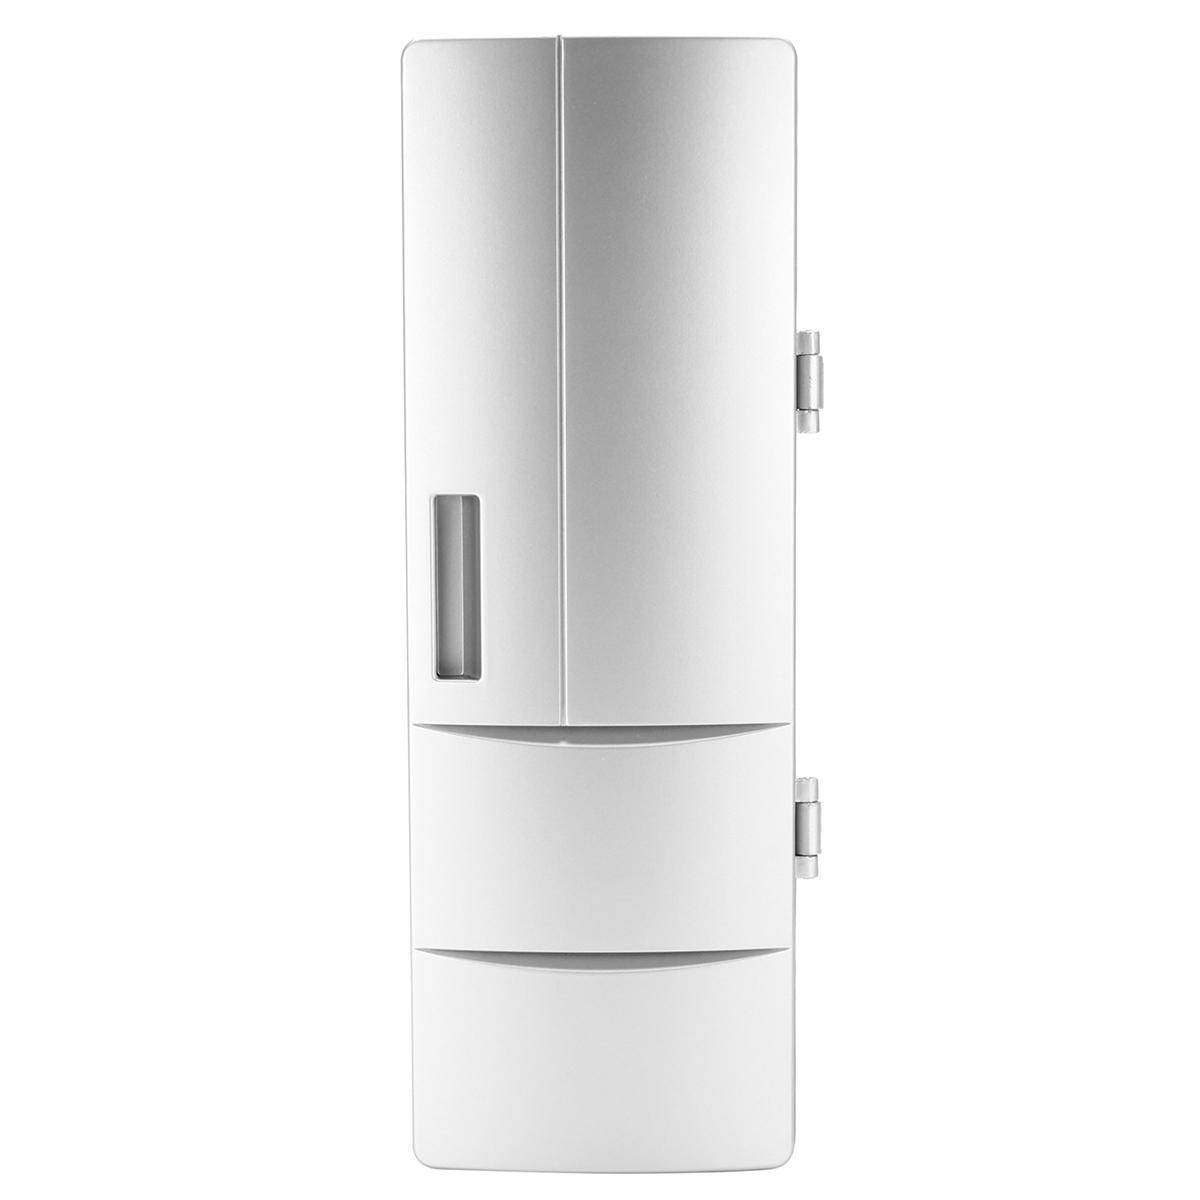 Portable USB Mini Refrigerator Fridge Freezer Beverage Drink Can Cooler  Warmer H